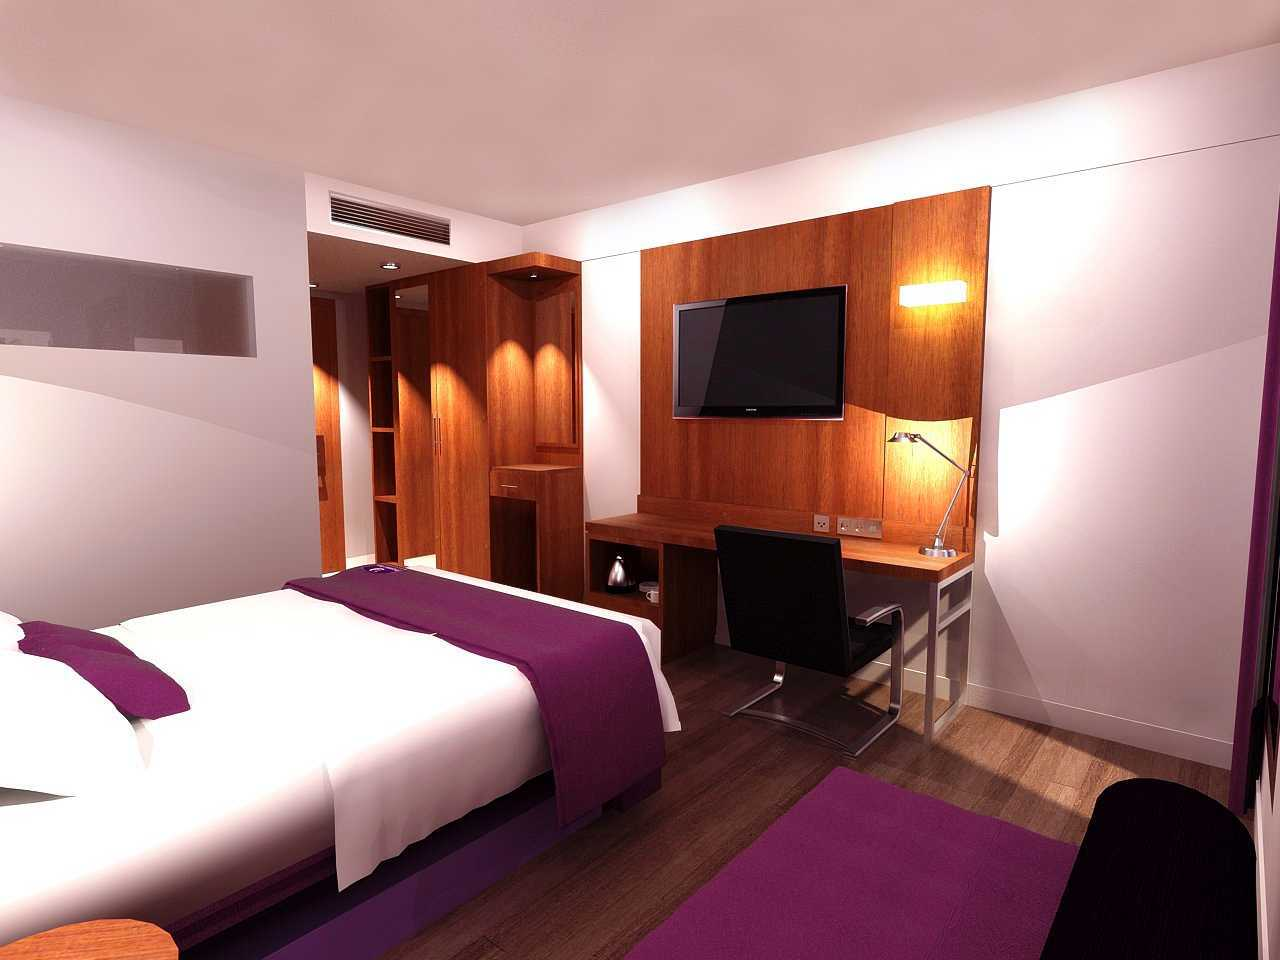 Limpad Sudibyo Premier Inn Hotel Jimbaran, Bali Jimbaran, Bali Room-2  27079